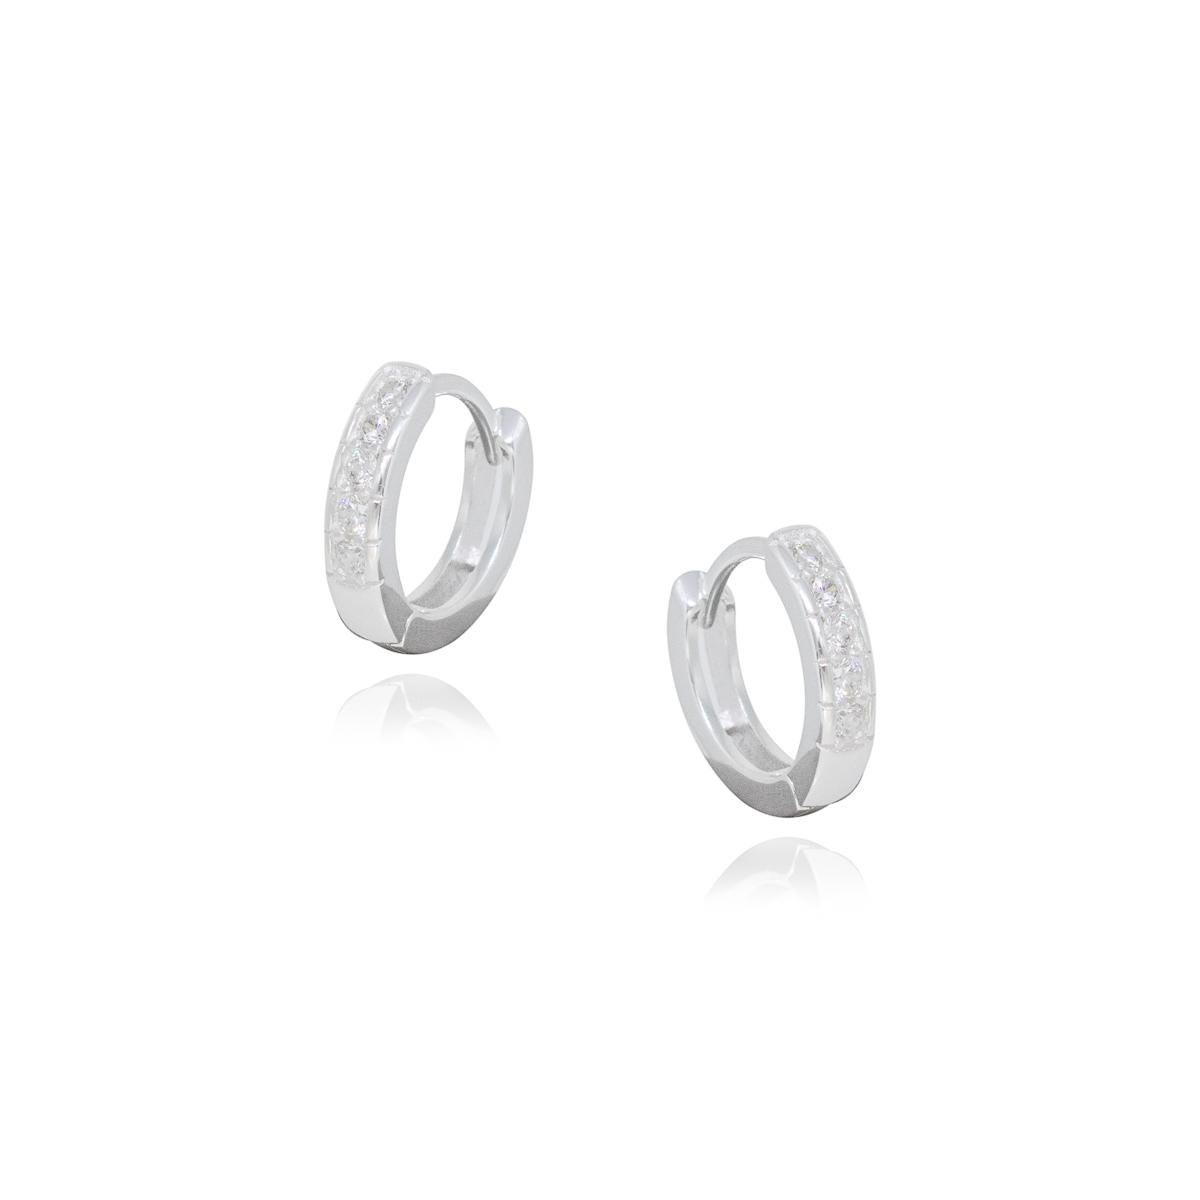 Argola joia prata 925 maciça cravejada em zirconia